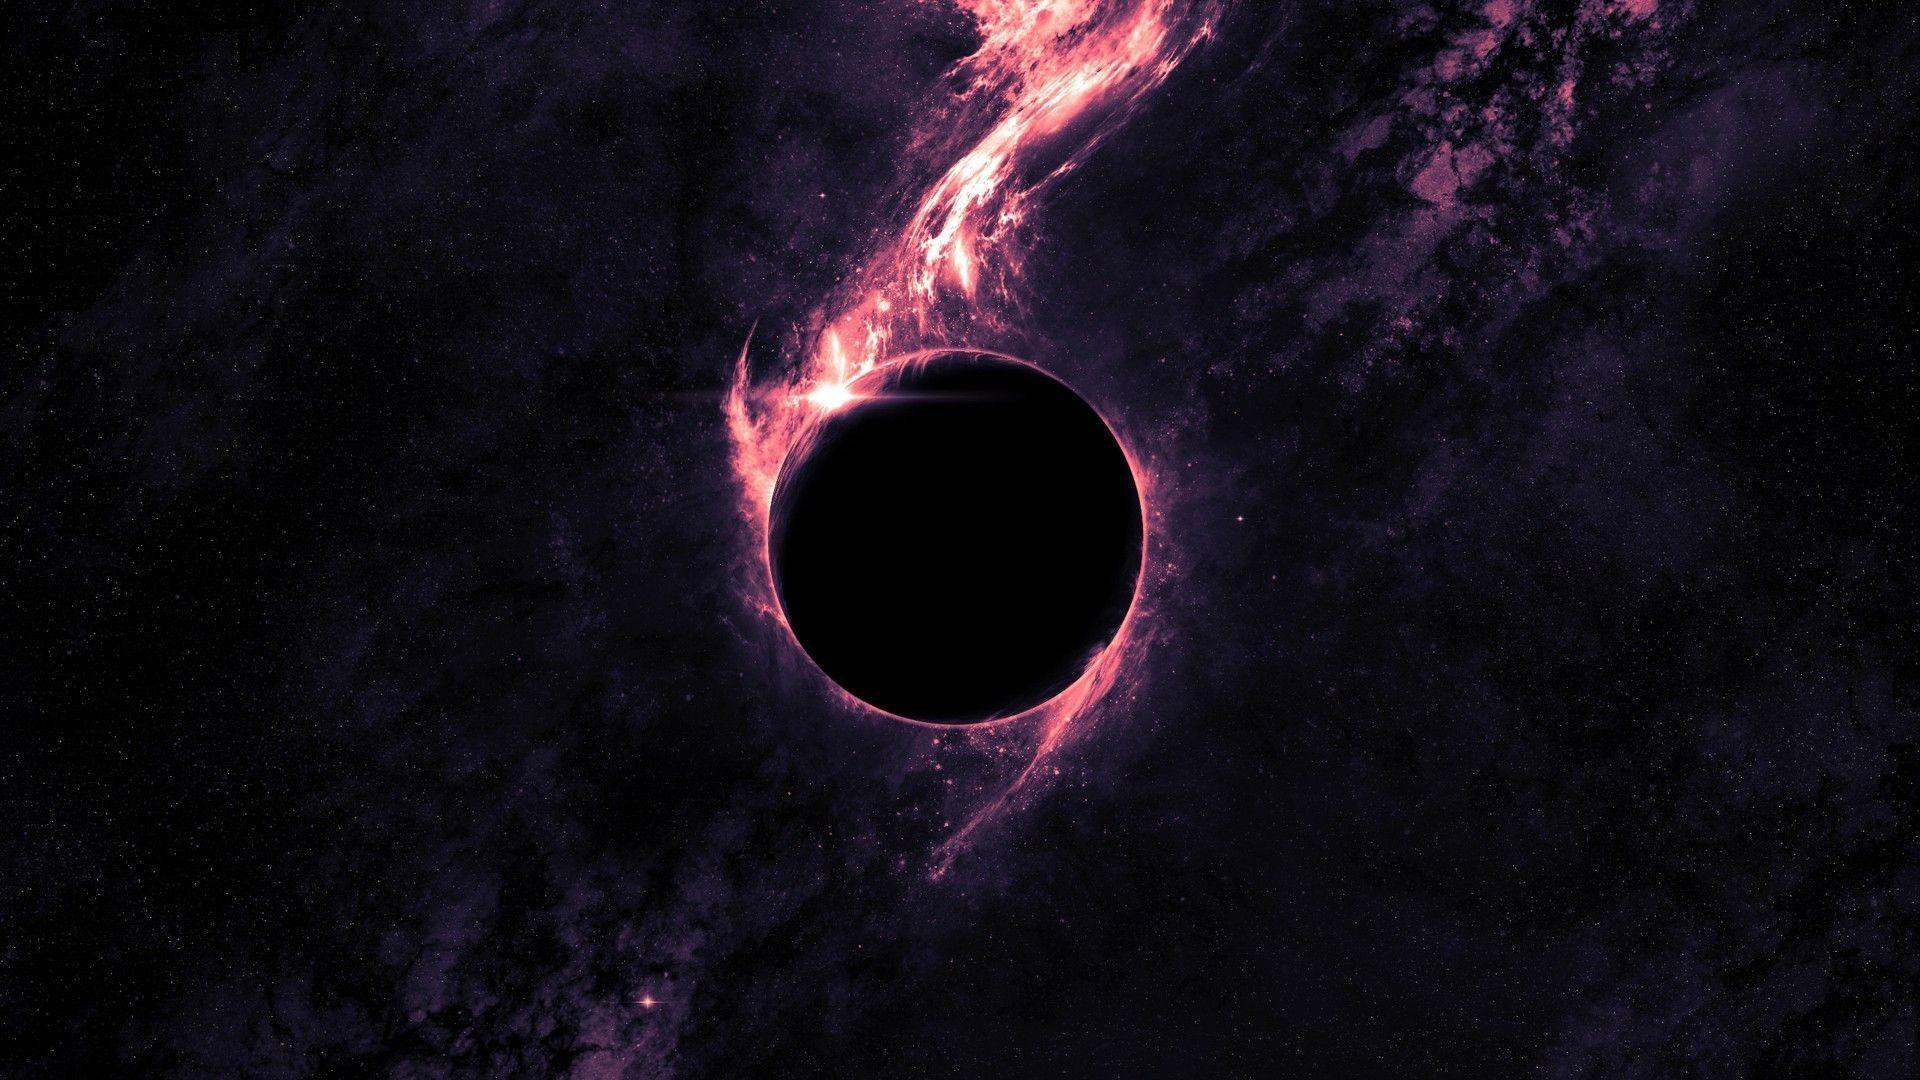 Black Planet Purple Nebula HD Wallpaper